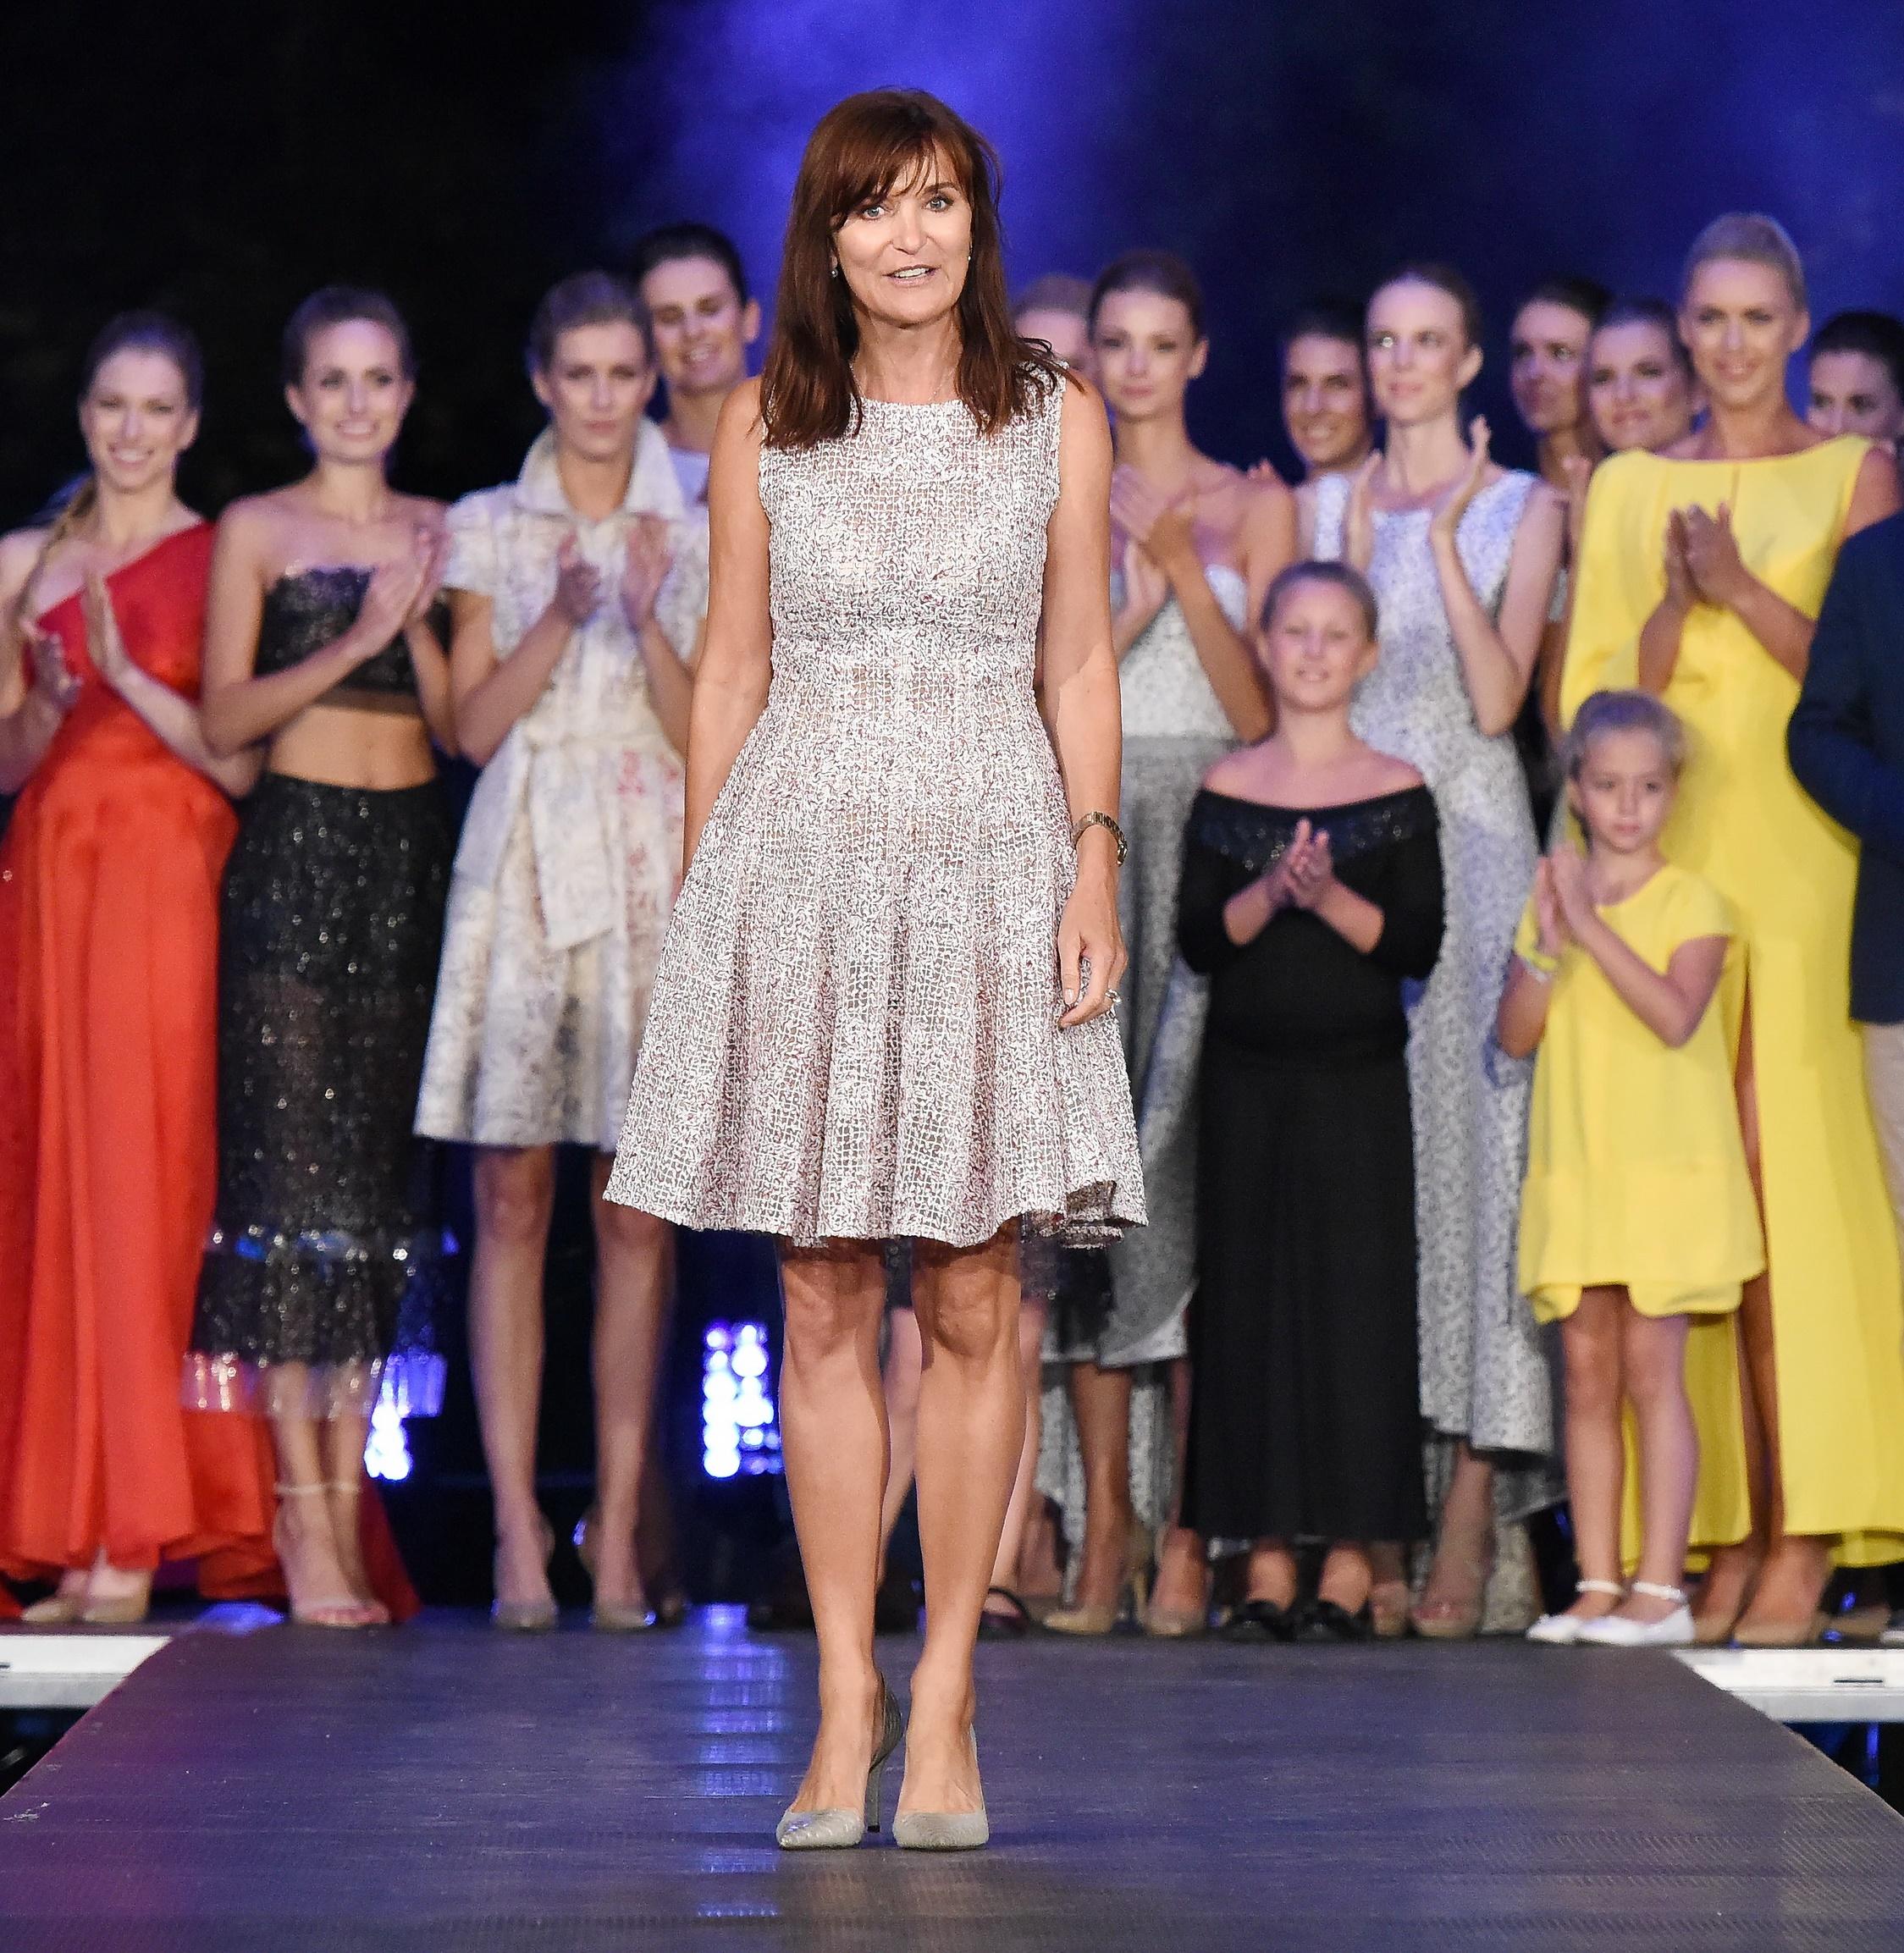 Autorka kolekce, módní návrhářka Beata Rajská, zdroj: Arthur Koff